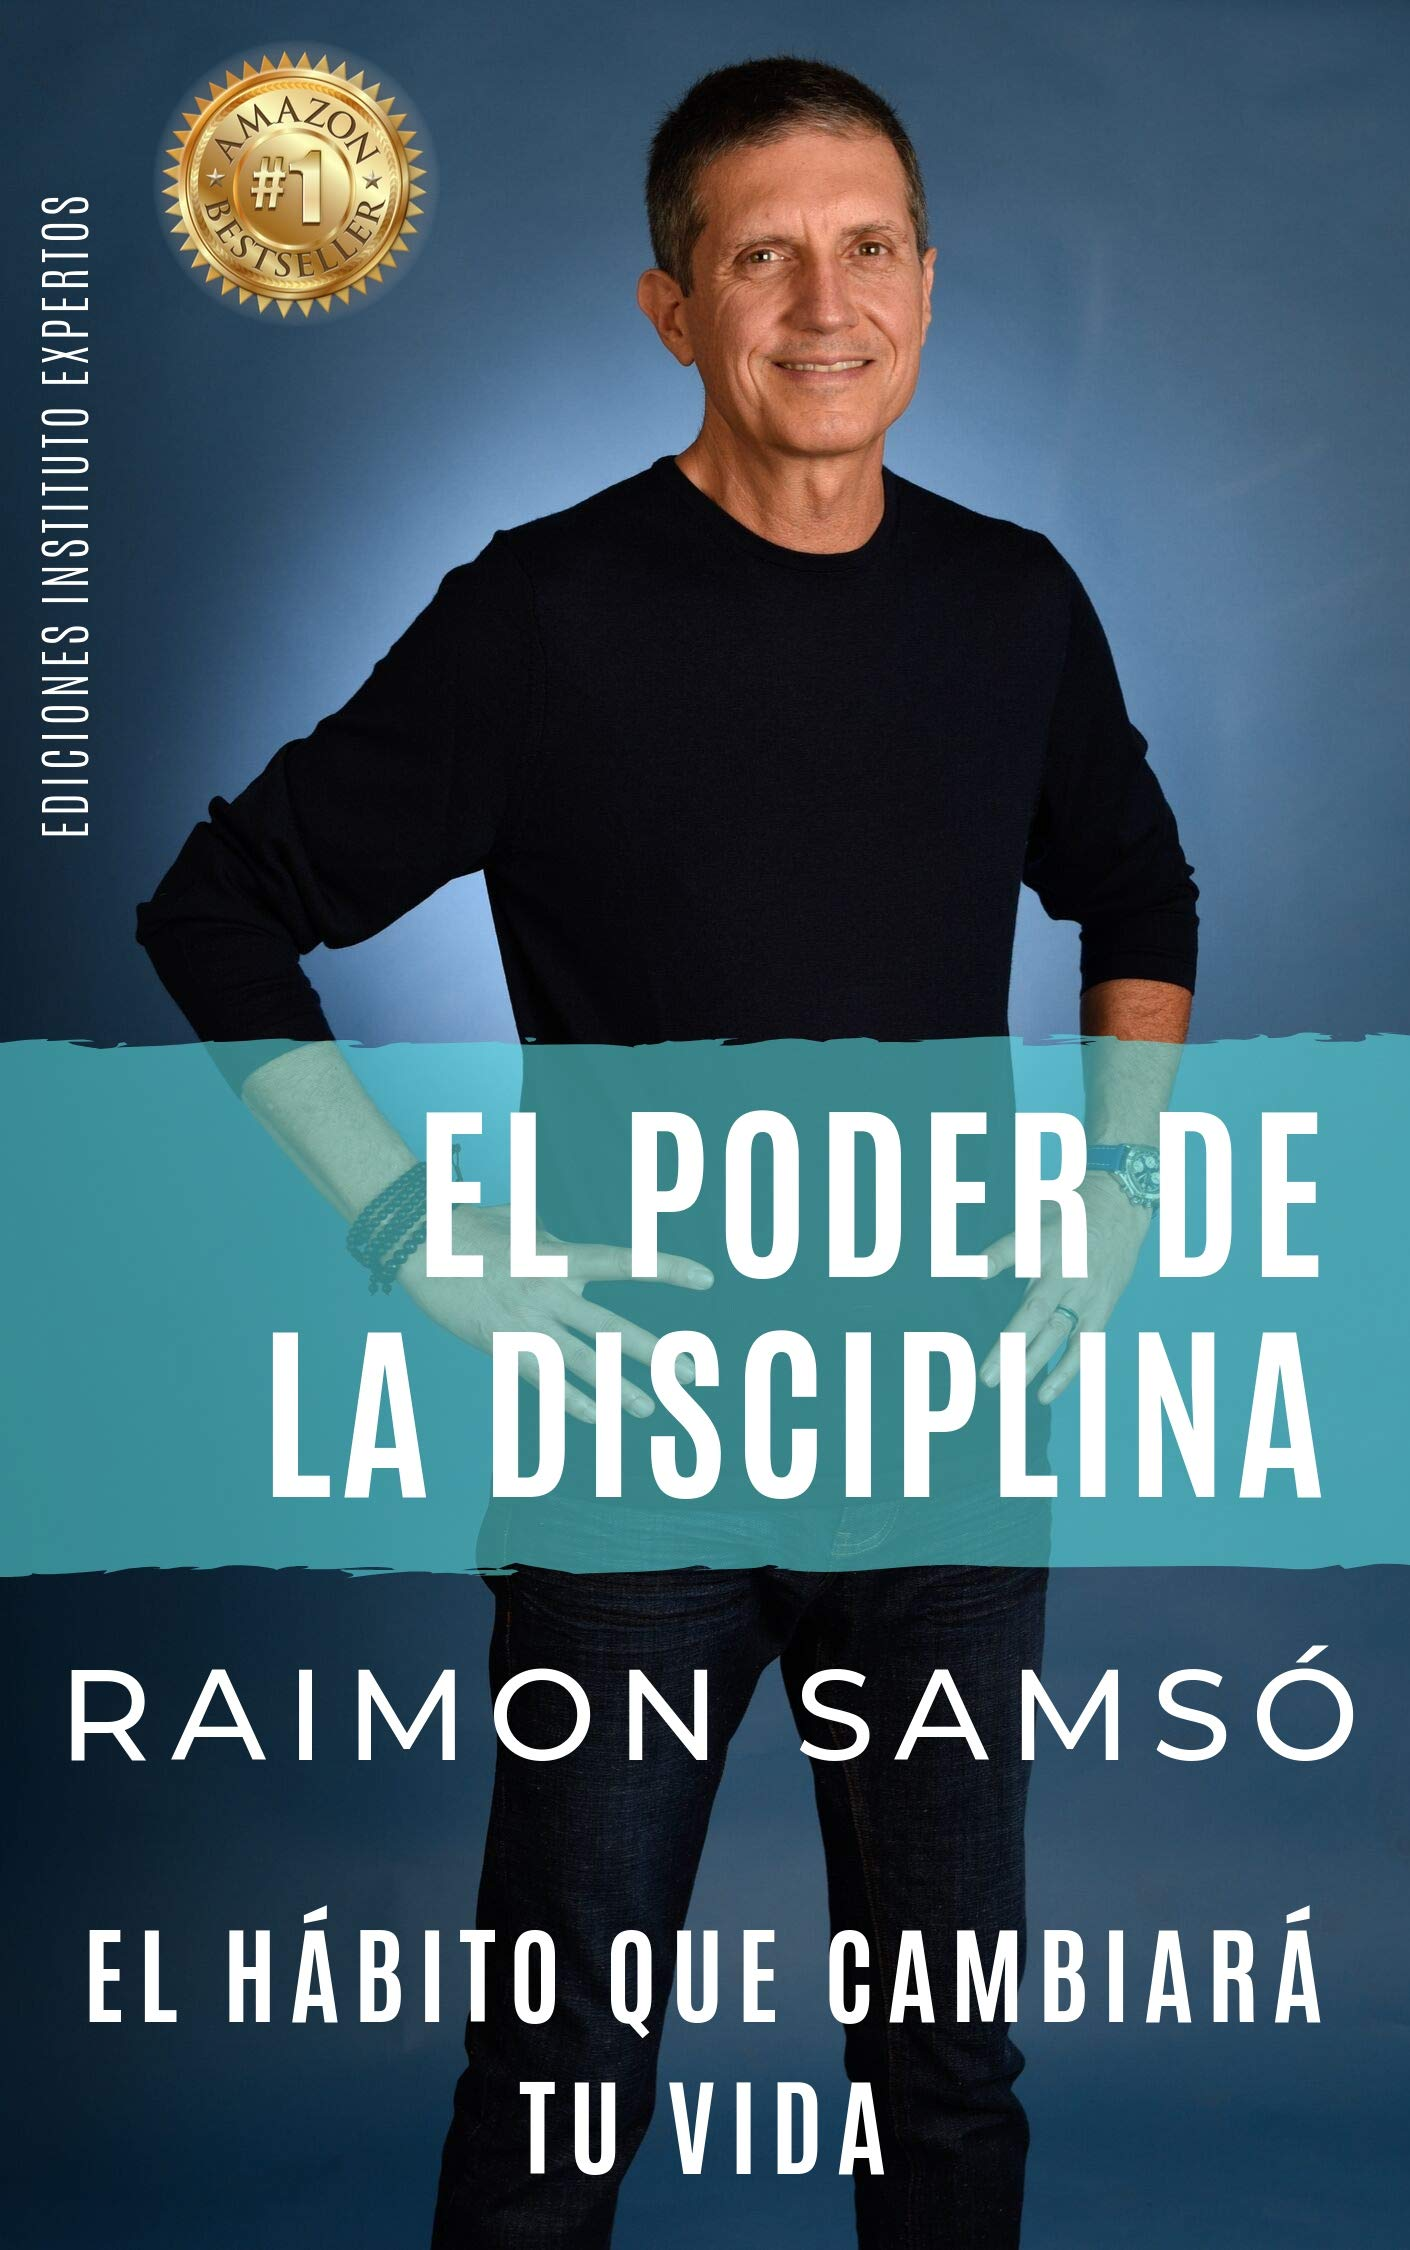 El Poder de la Disciplina: El Hábito que Cambiará tu Vida (Poder Infinito nº 2)